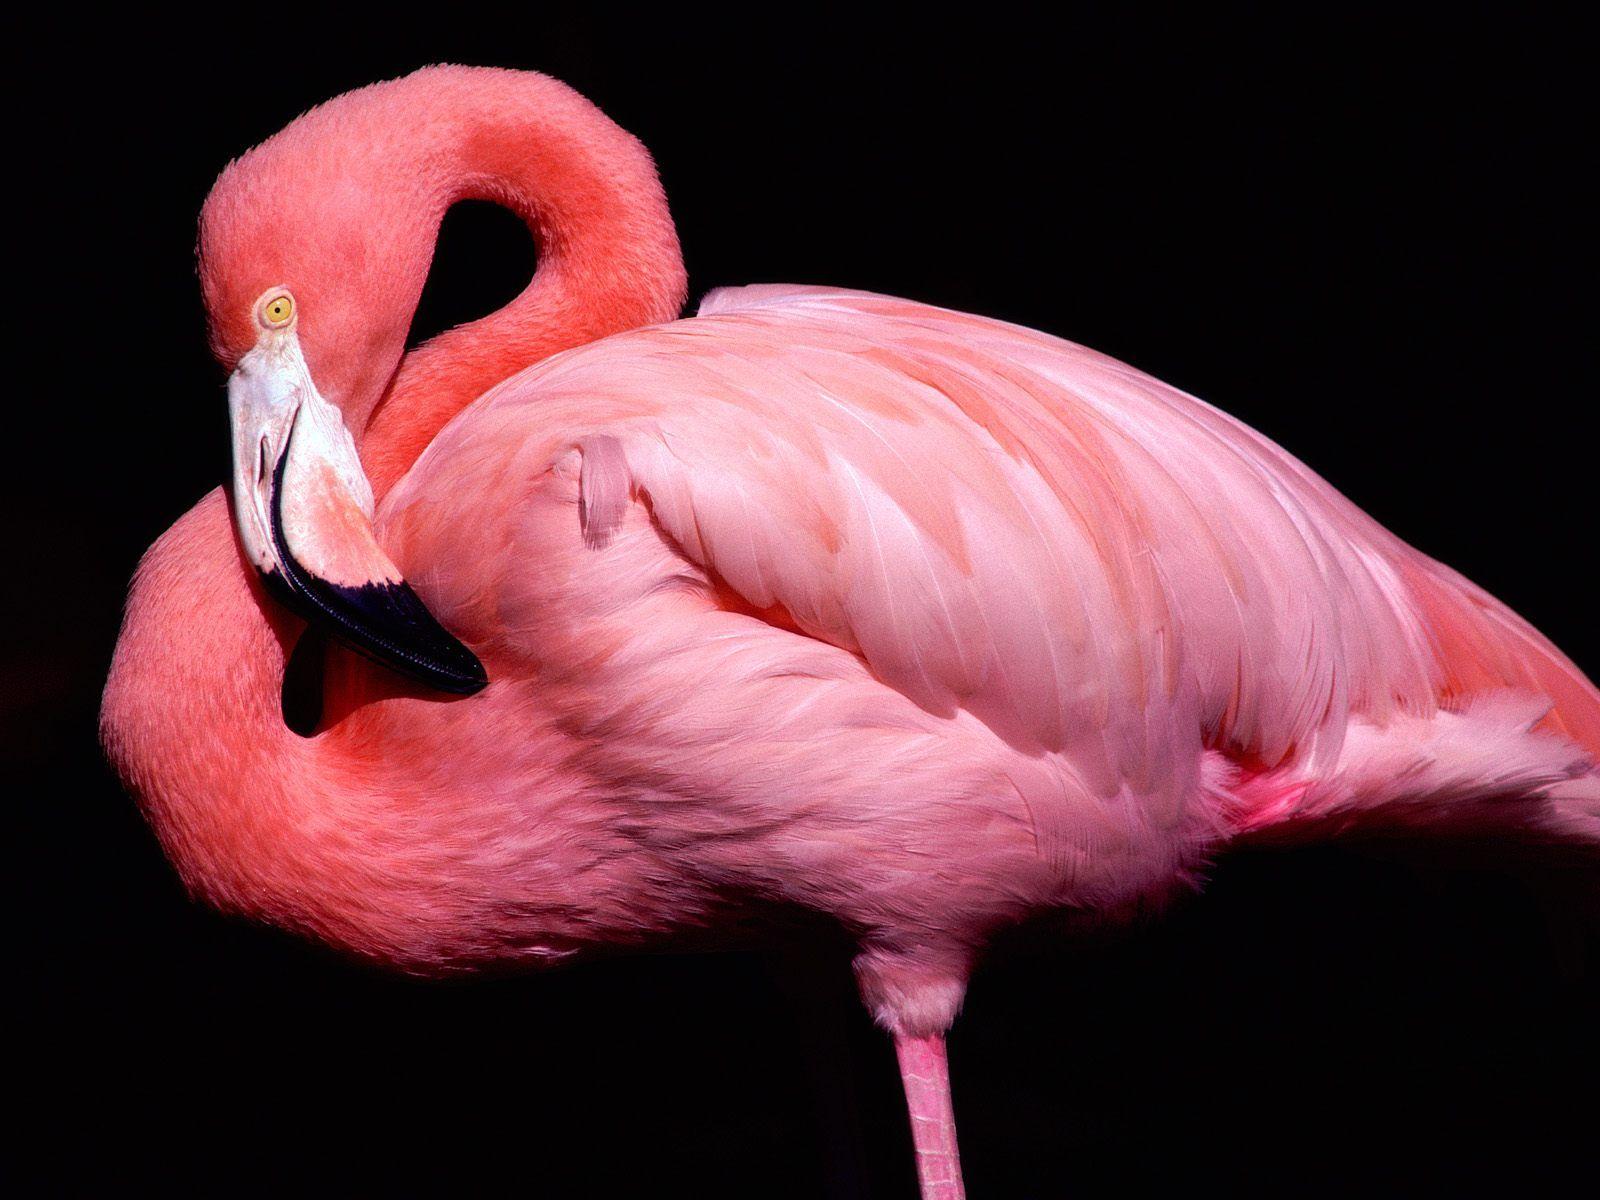 Background flamingo flamingos iphone wallpaper wallpaper - Flamingo Wallpaper From Animal Lovers